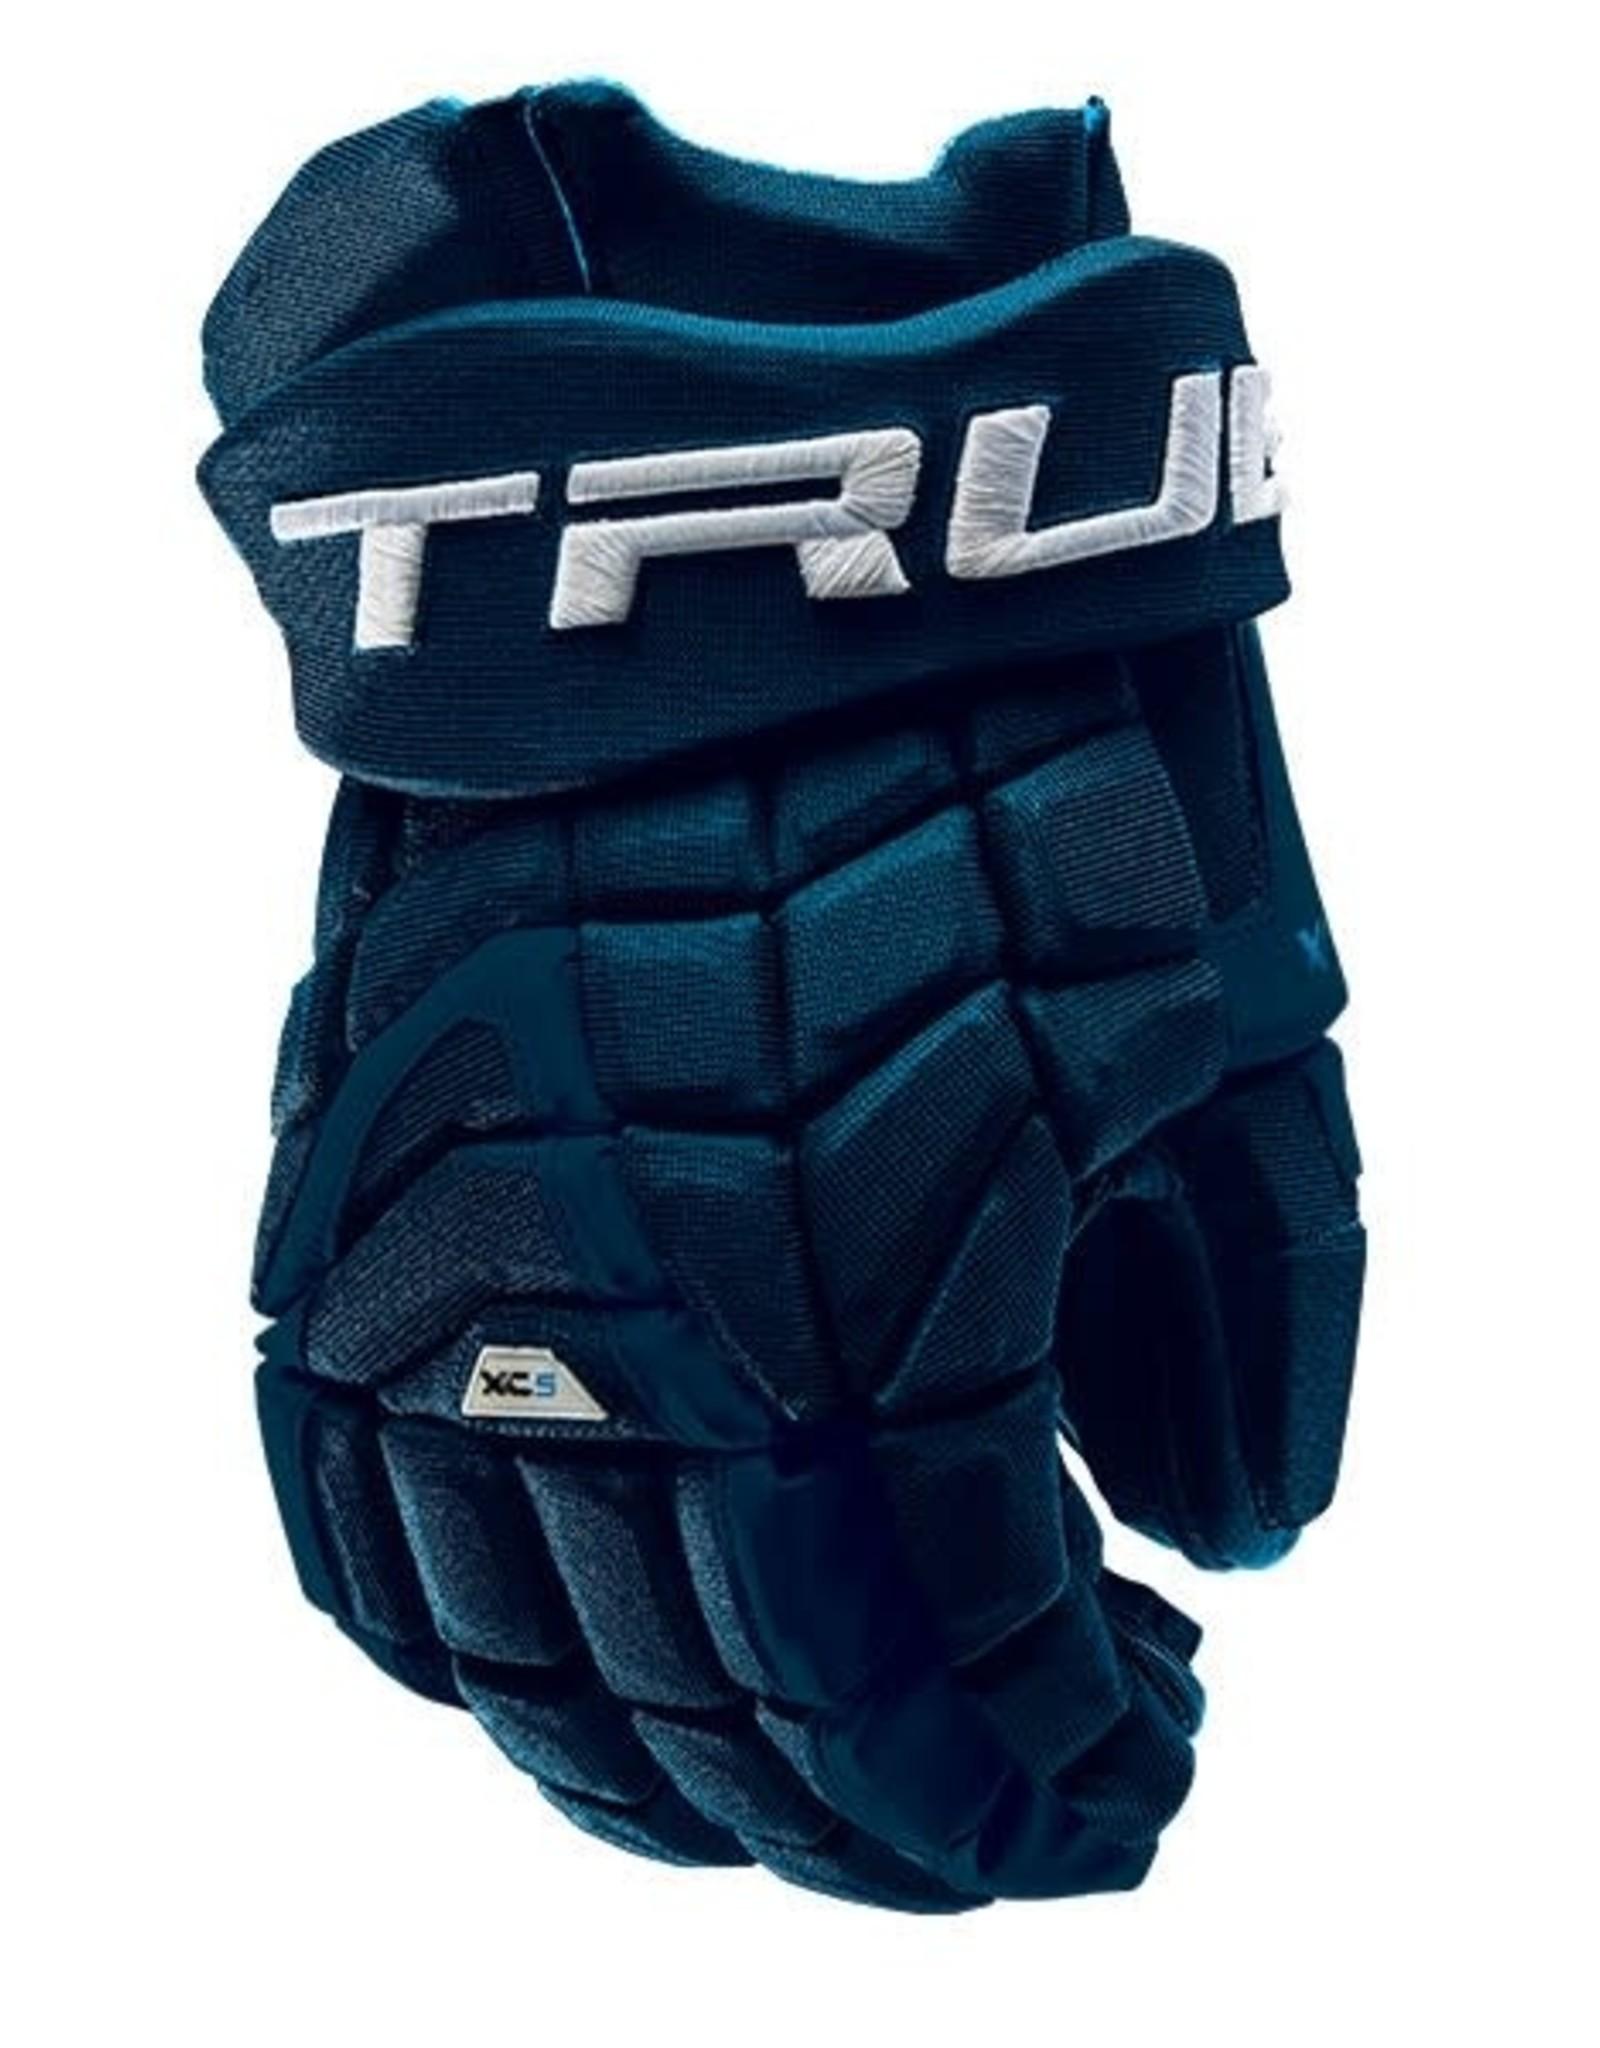 TRUE TRUE XC5 Tapered Glove (JUNIOR)